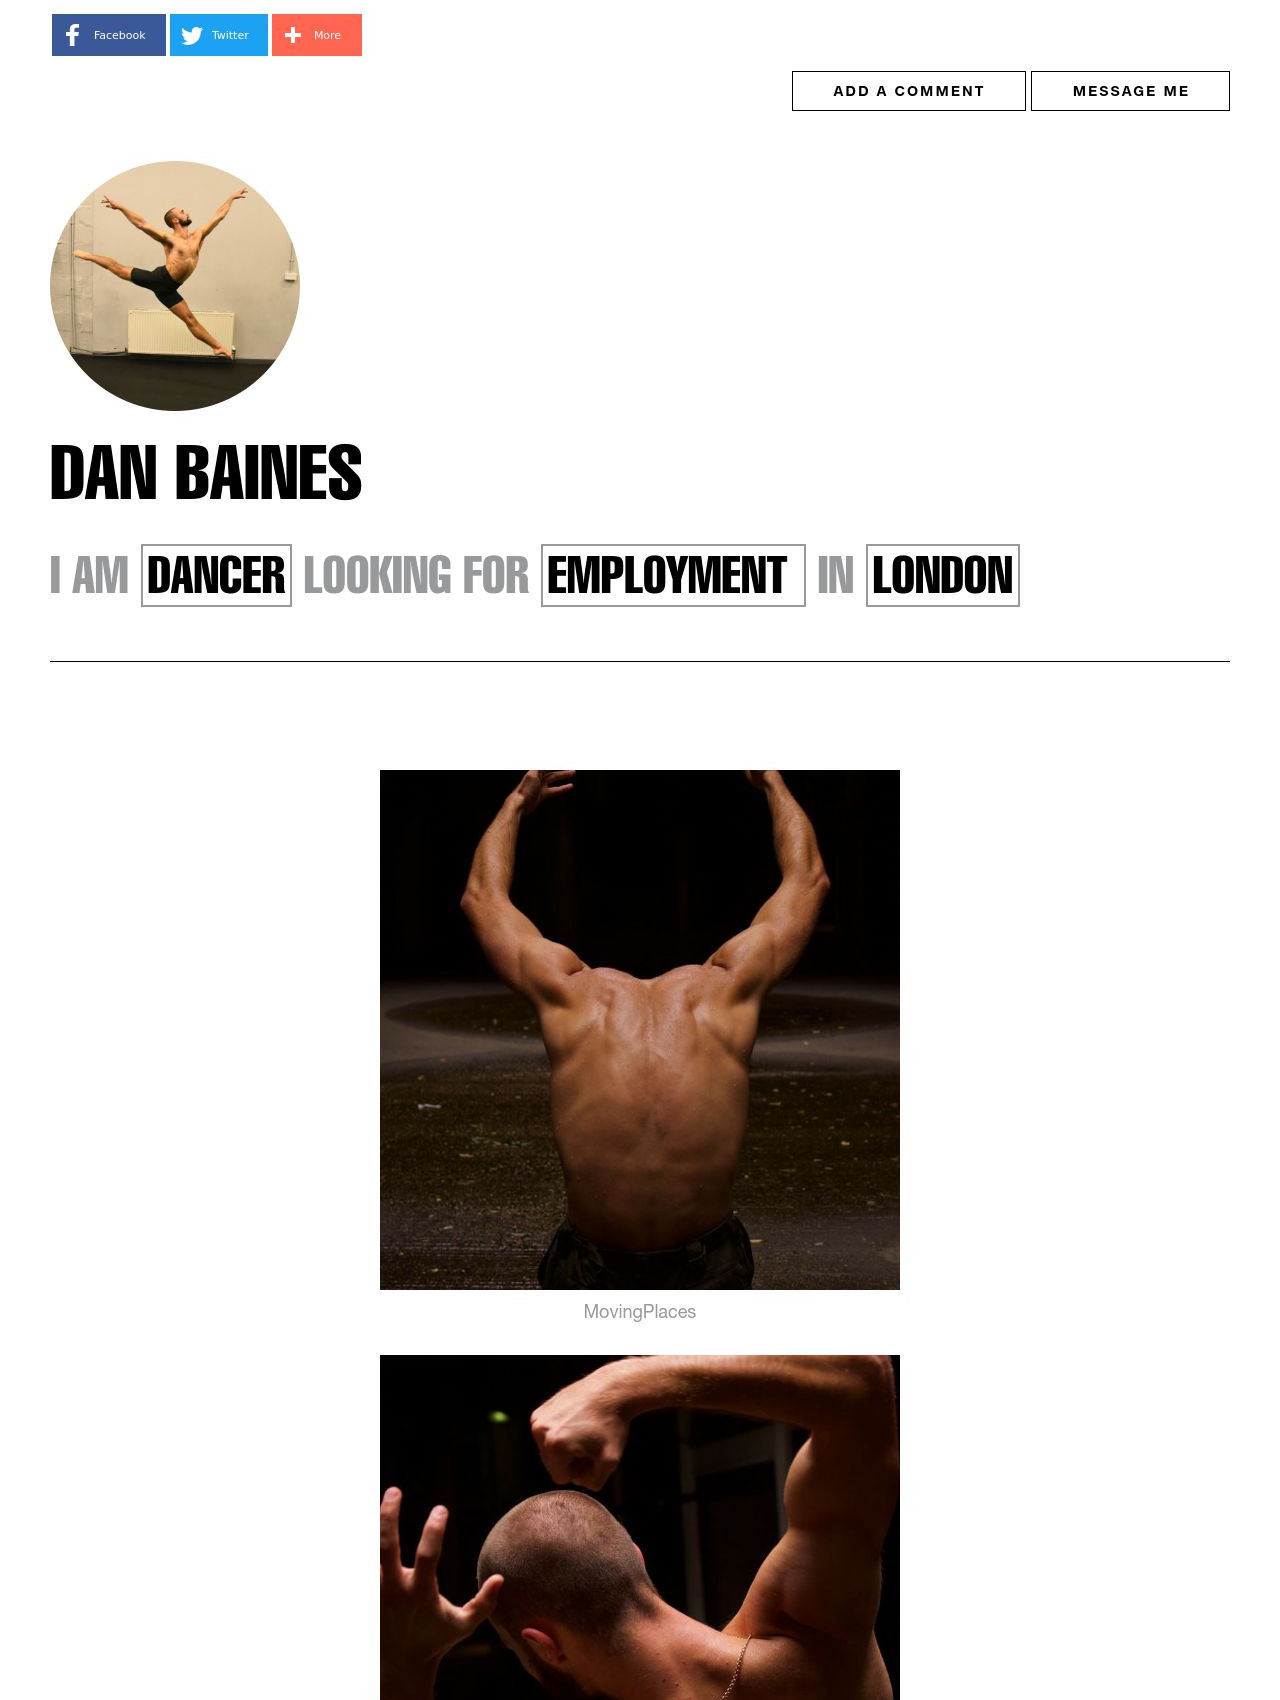 Dan Baines